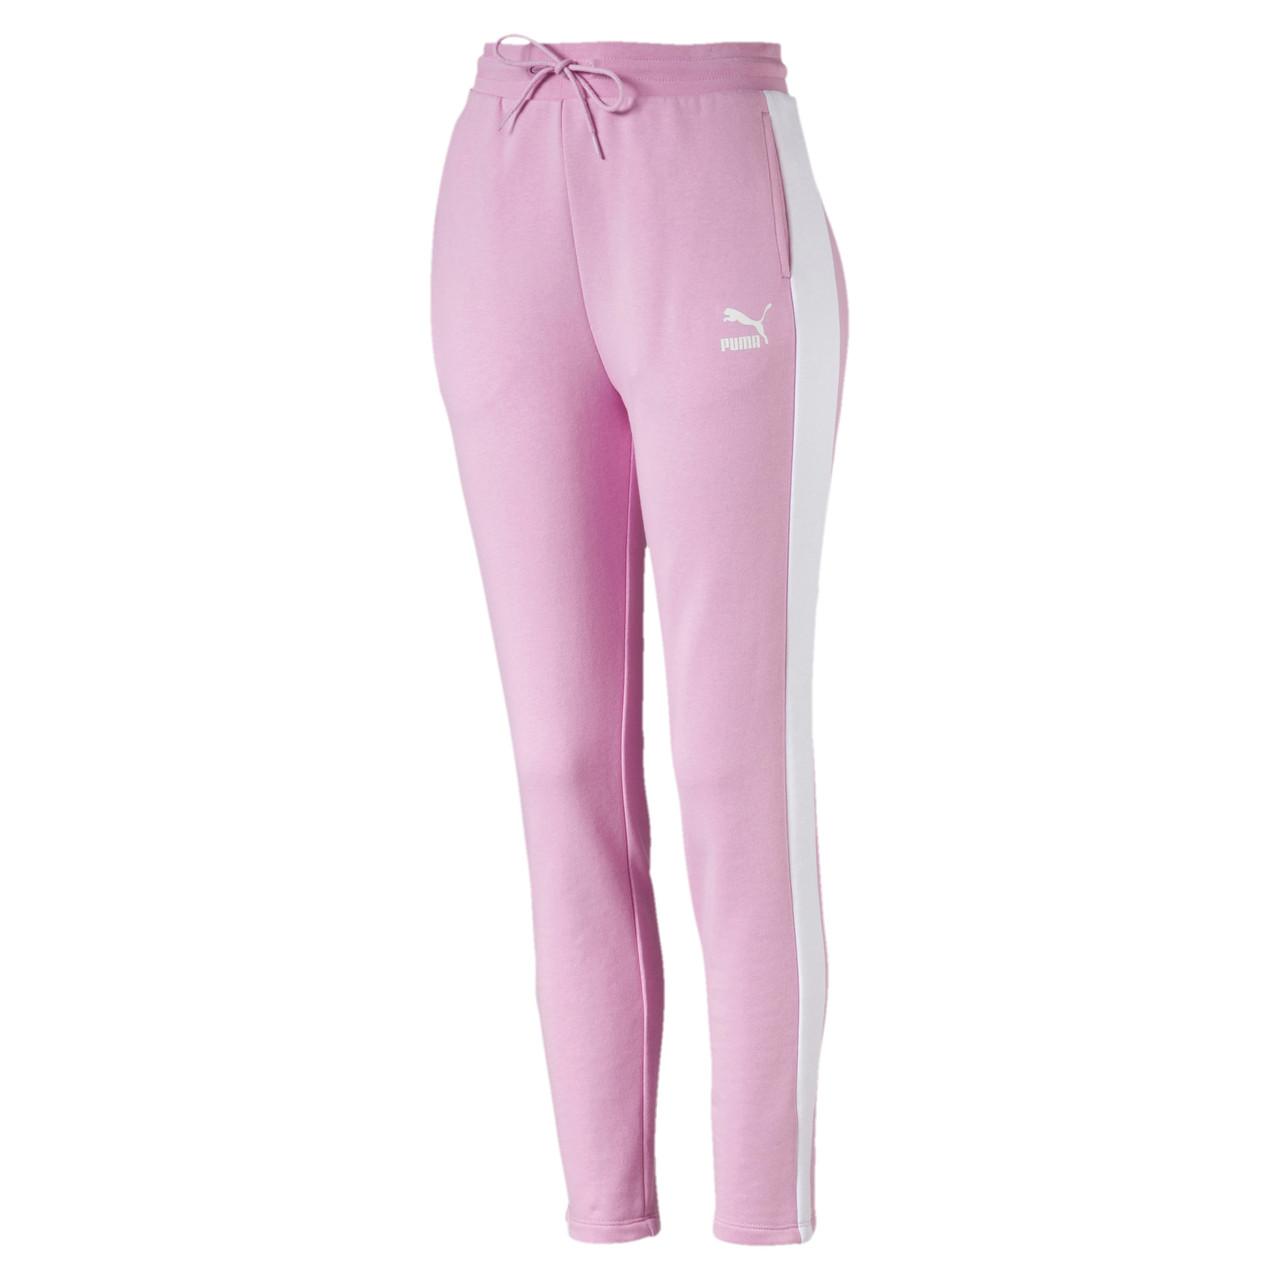 Женские спортивные брюки Classics T7 Track Pant Ft